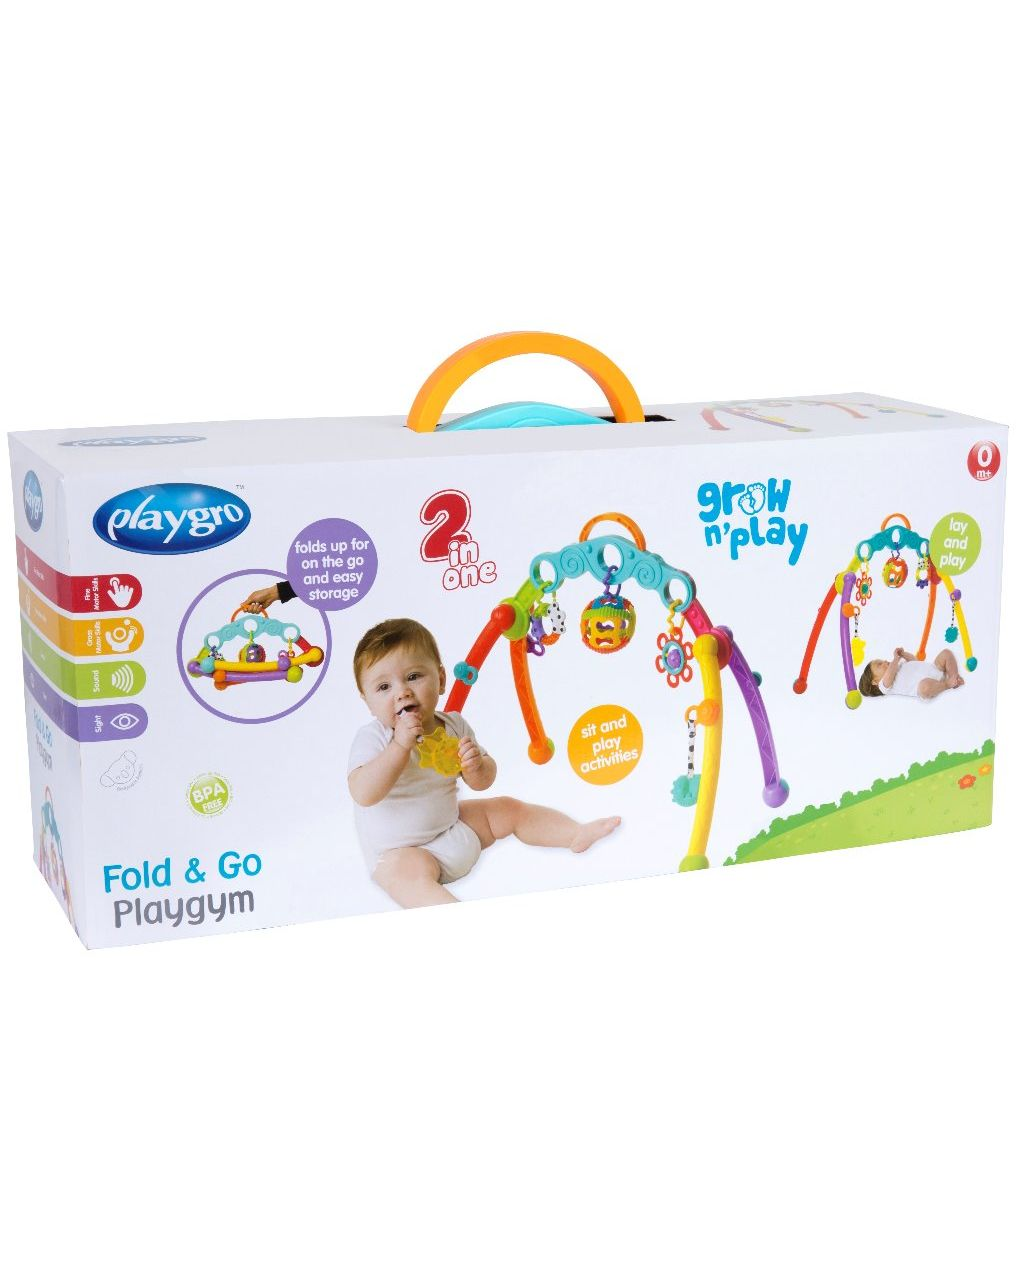 Playgro - fold and go playgym - Playgro